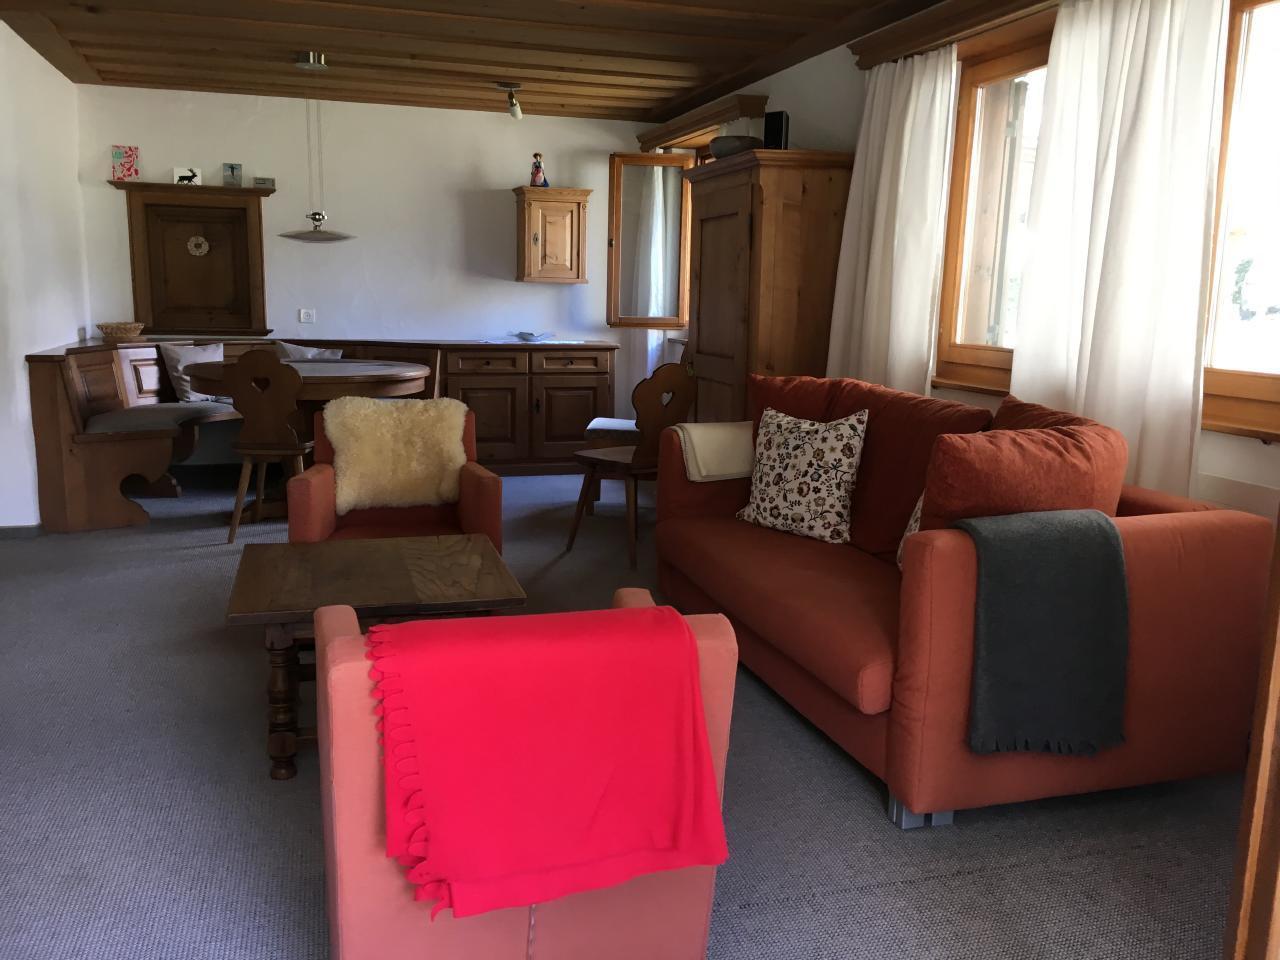 Appartement de vacances Geschmackvolle 3 1/2 -Zimmer Wohnung